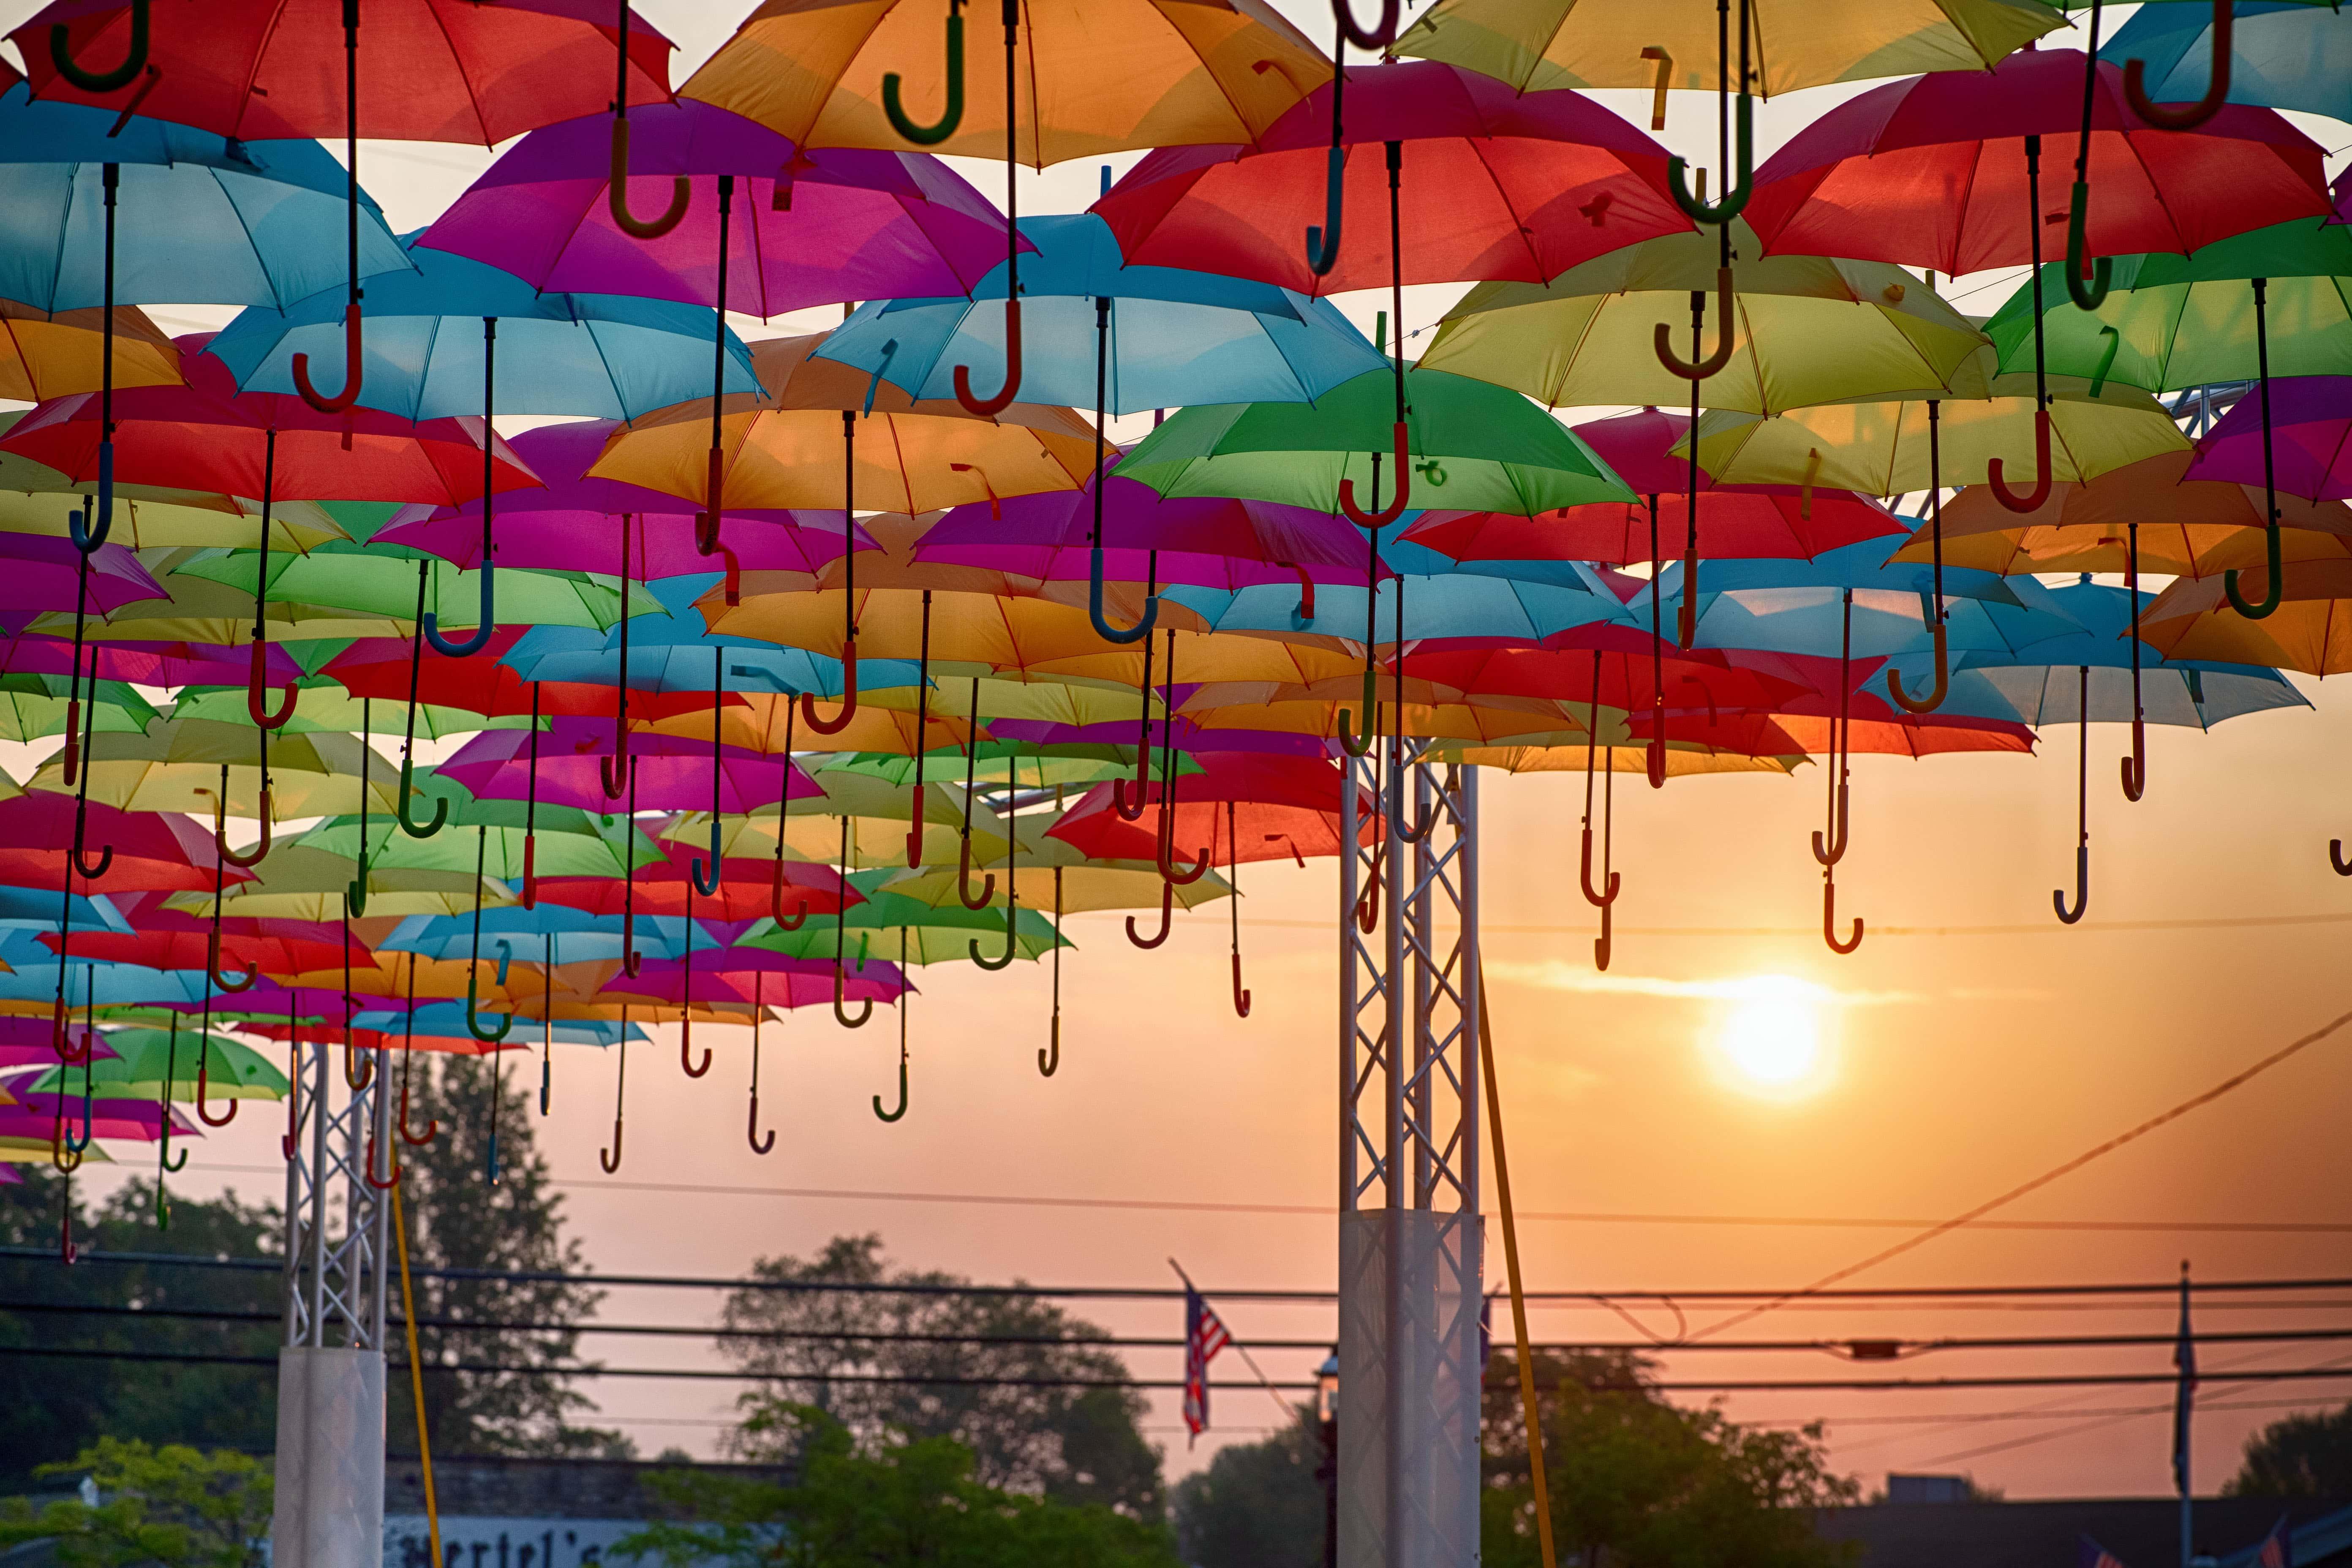 Umbrella Art in Downtown Batesville